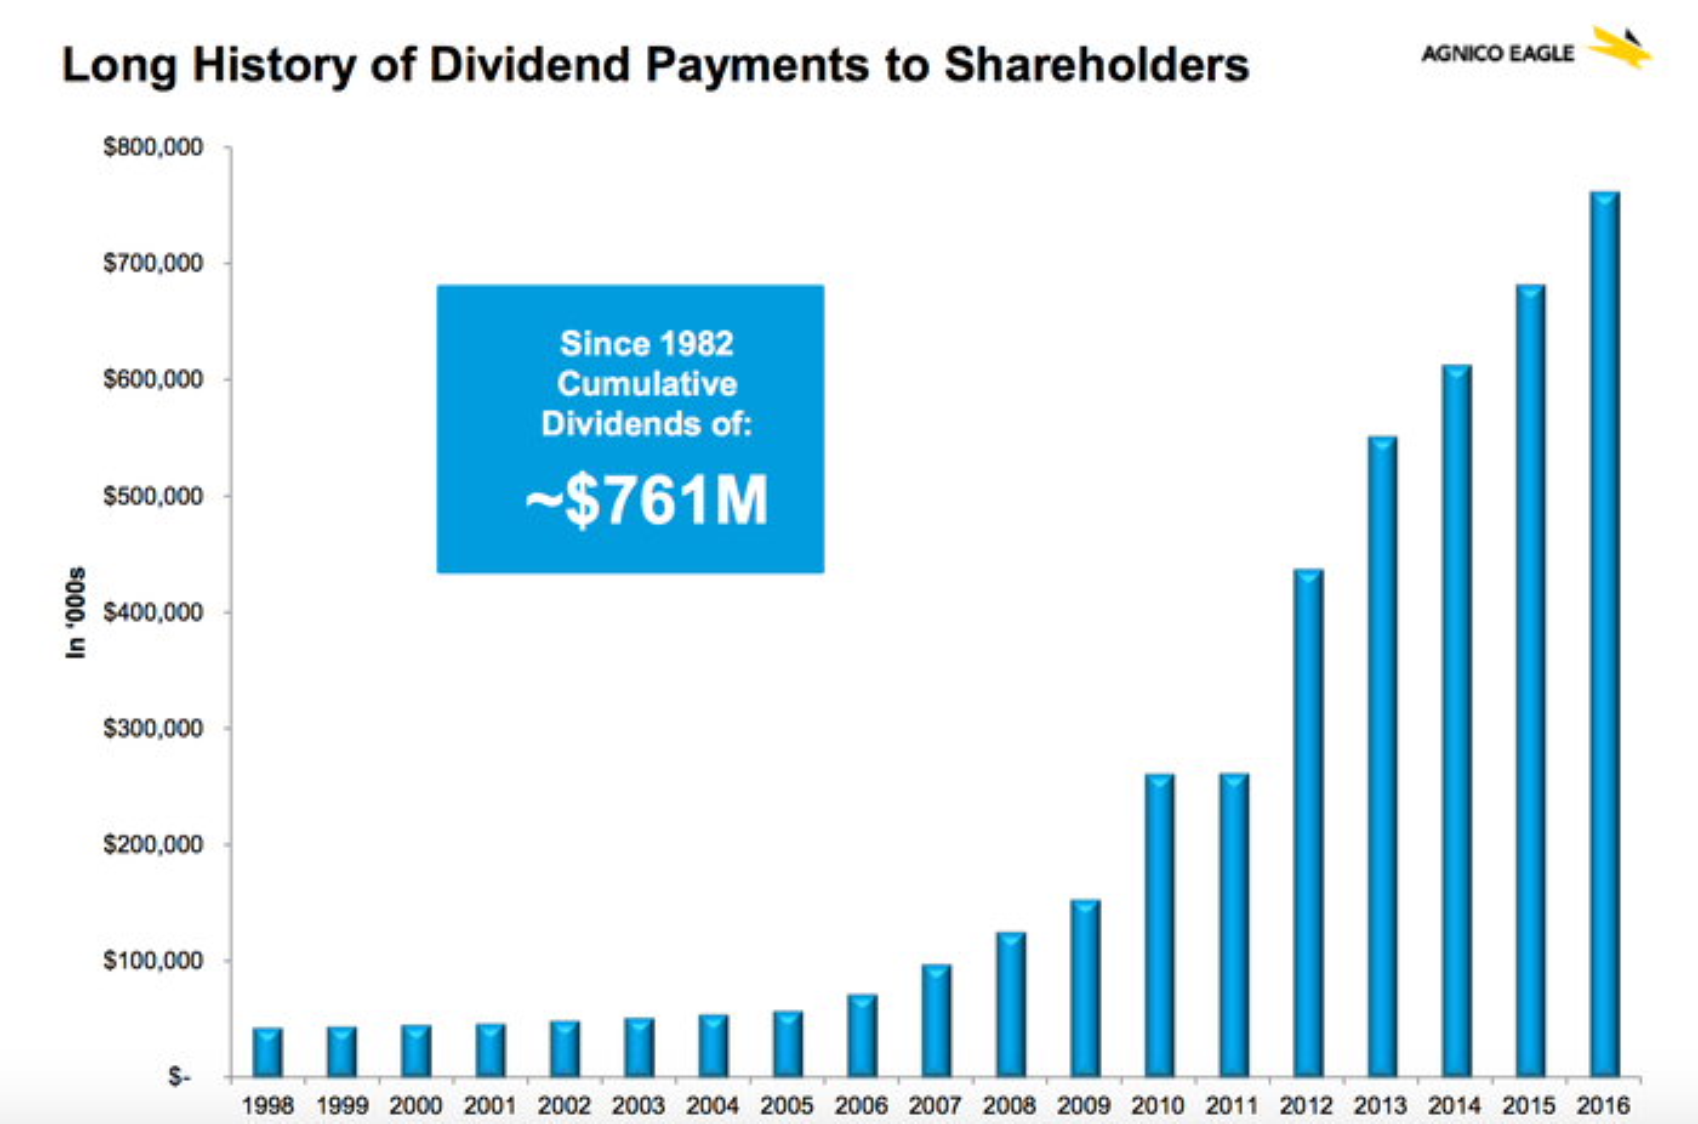 Agnico Eagle has returned $761 million in cumulative dividends since 1982.